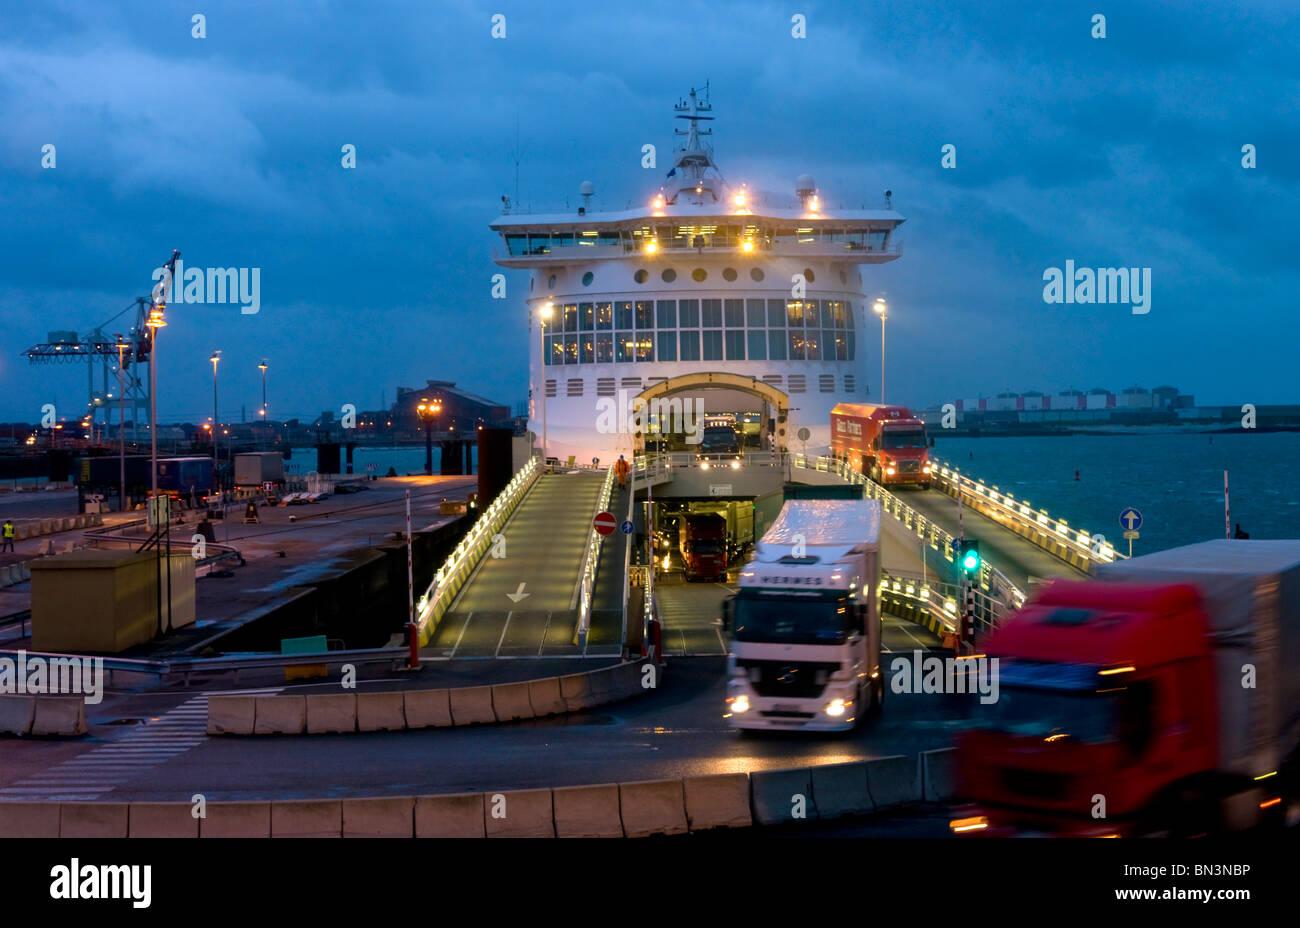 Car ferry in harbour, Dunkirk, Nord-Pas-de-Calais, France, Europe - Stock Image